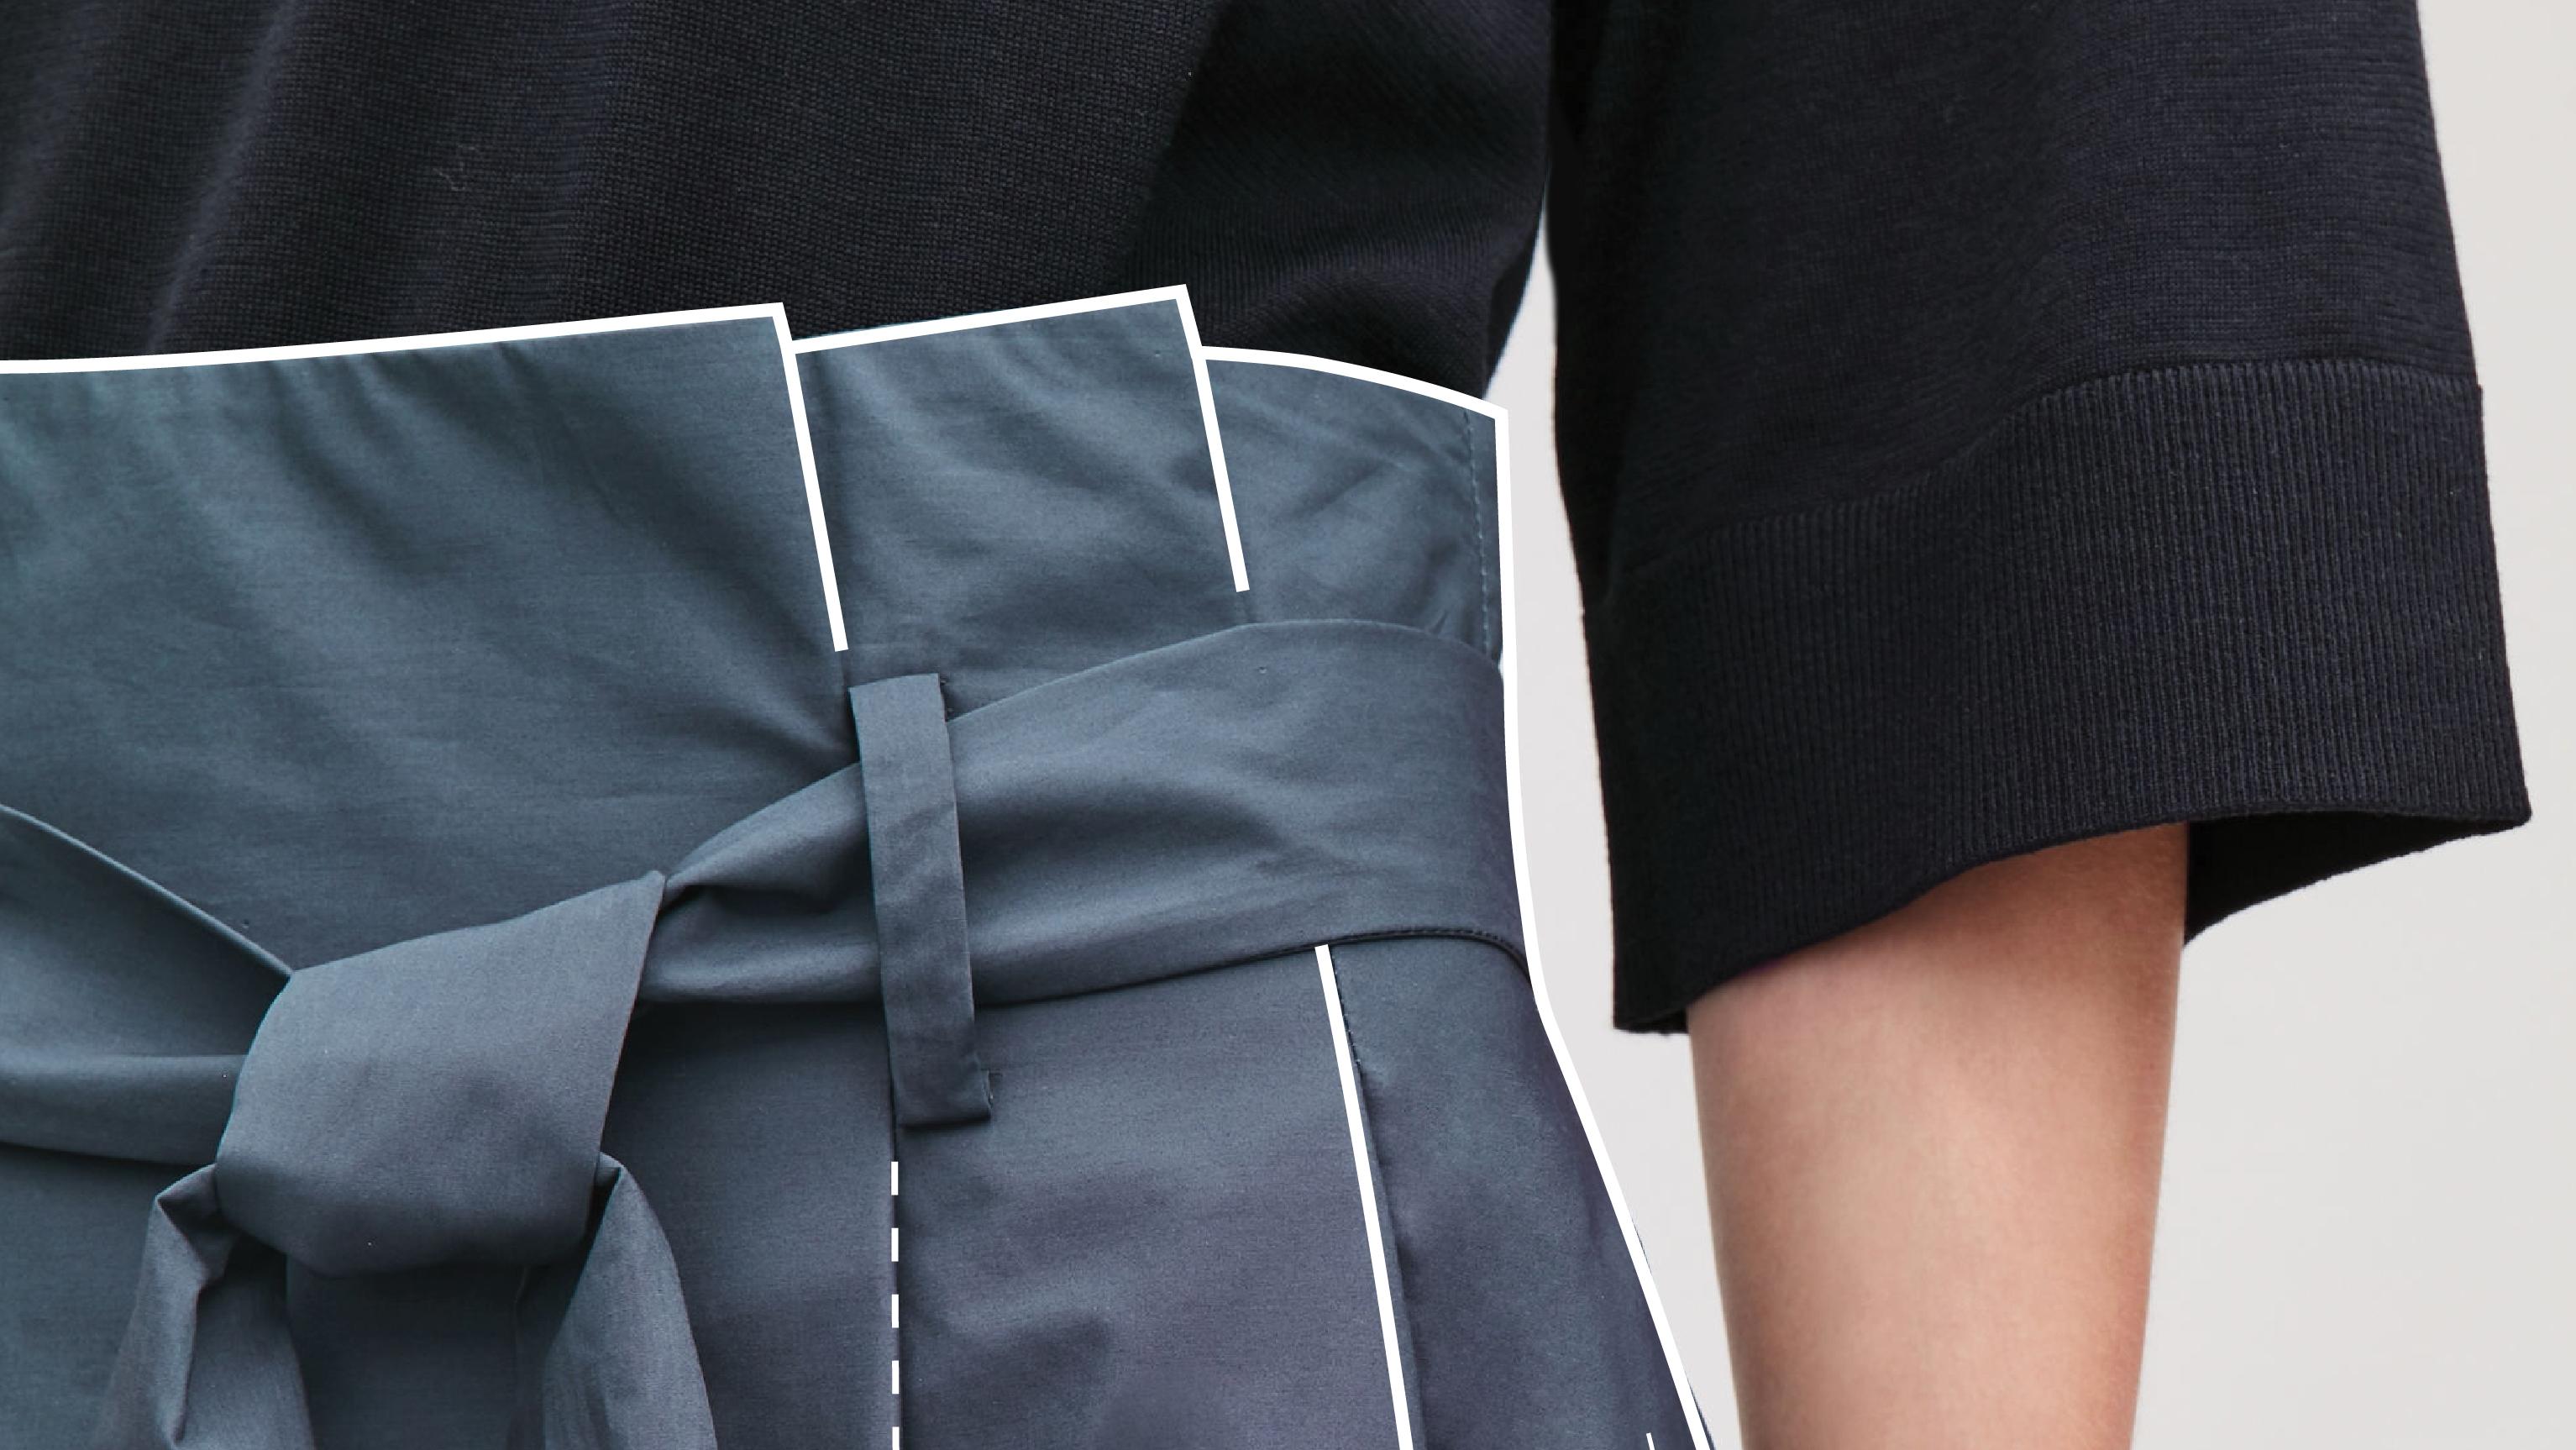 ژوژمان پایان دوره «الگو و دوخت پوشاک زنانه (نازک دوزی)»